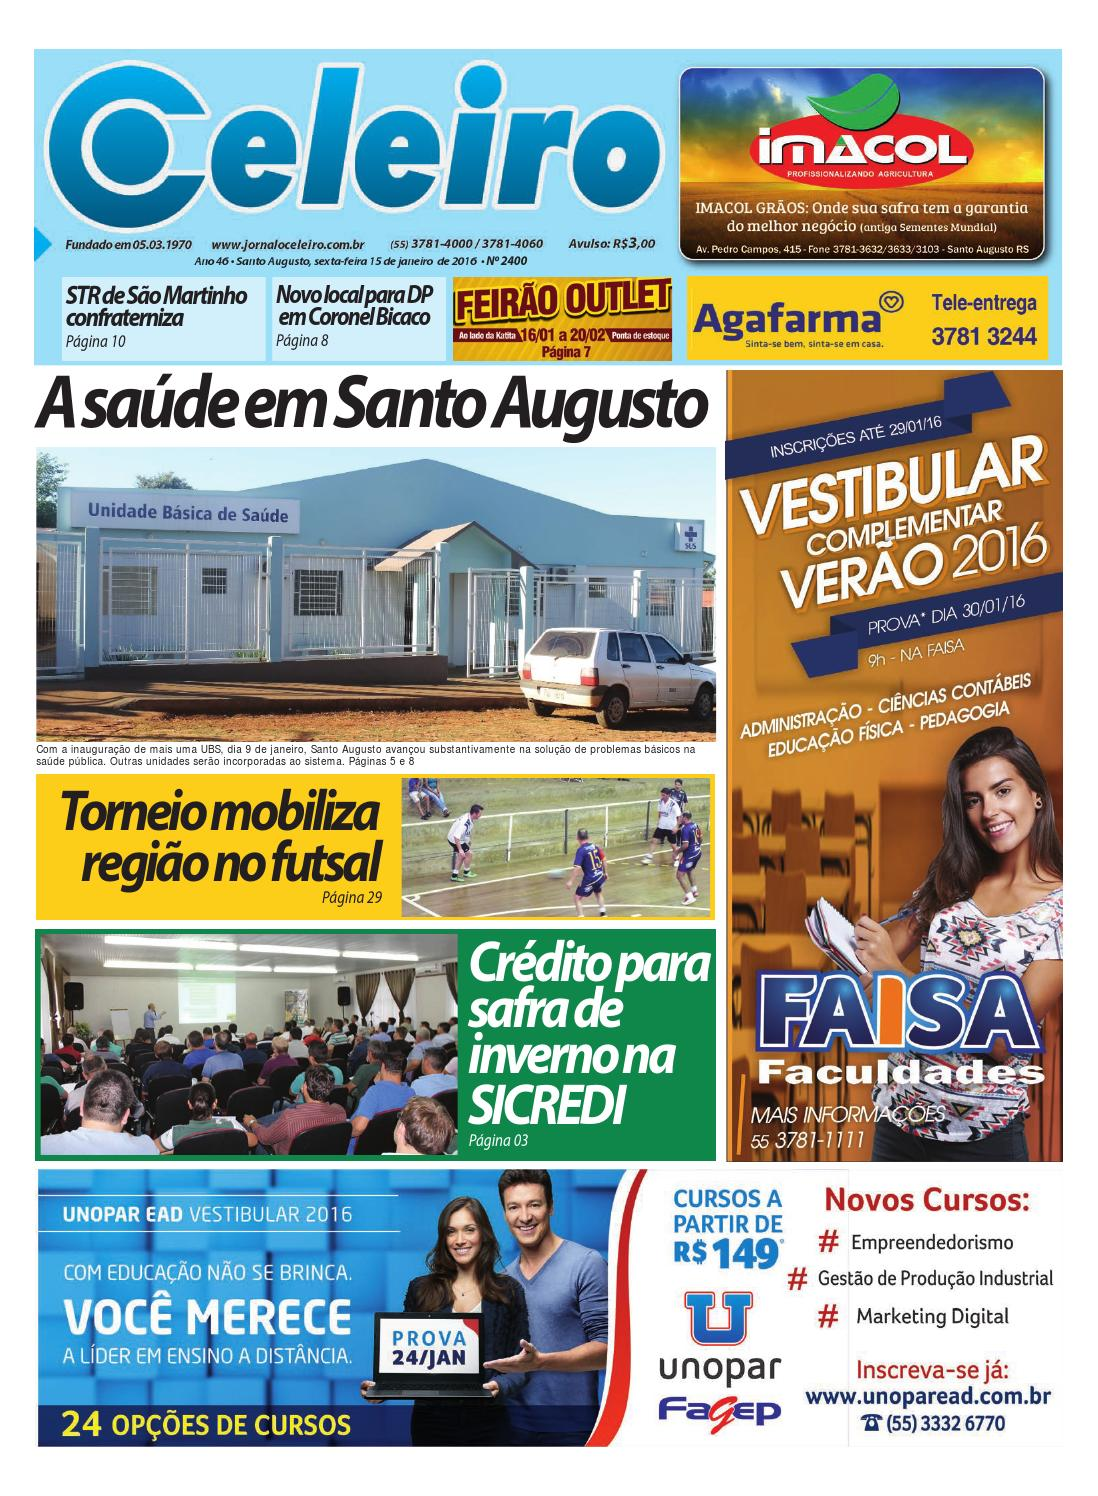 6565698064 Binder1 by O celeiro Jornal - issuu